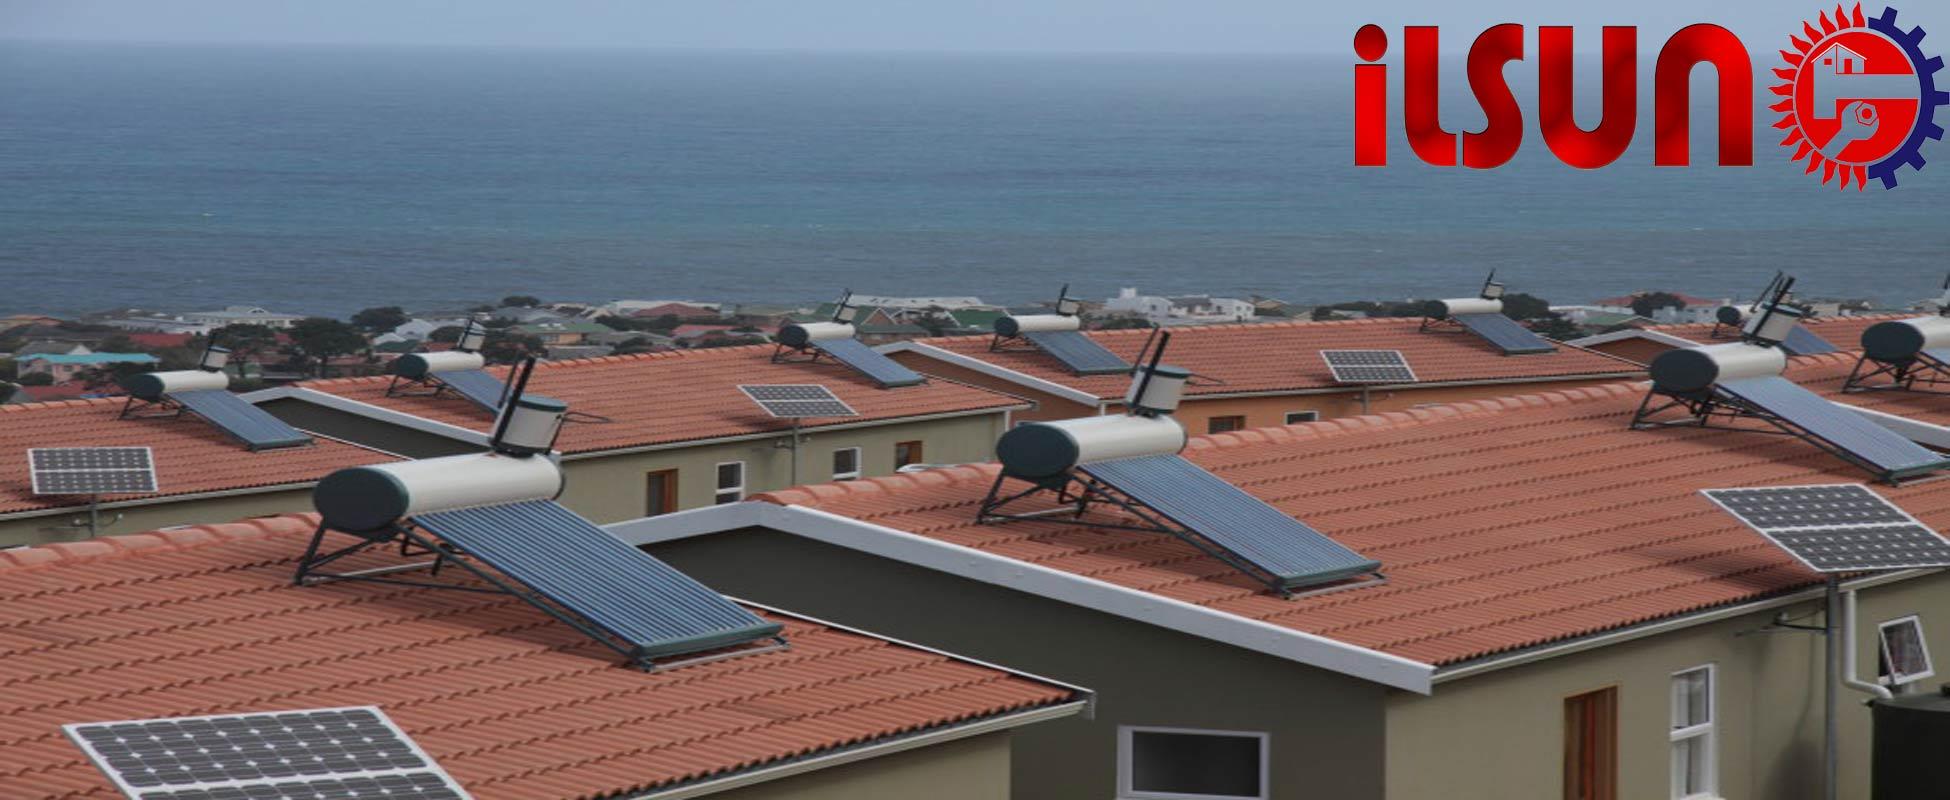 آبگرمکن خورشیدی کم فشار